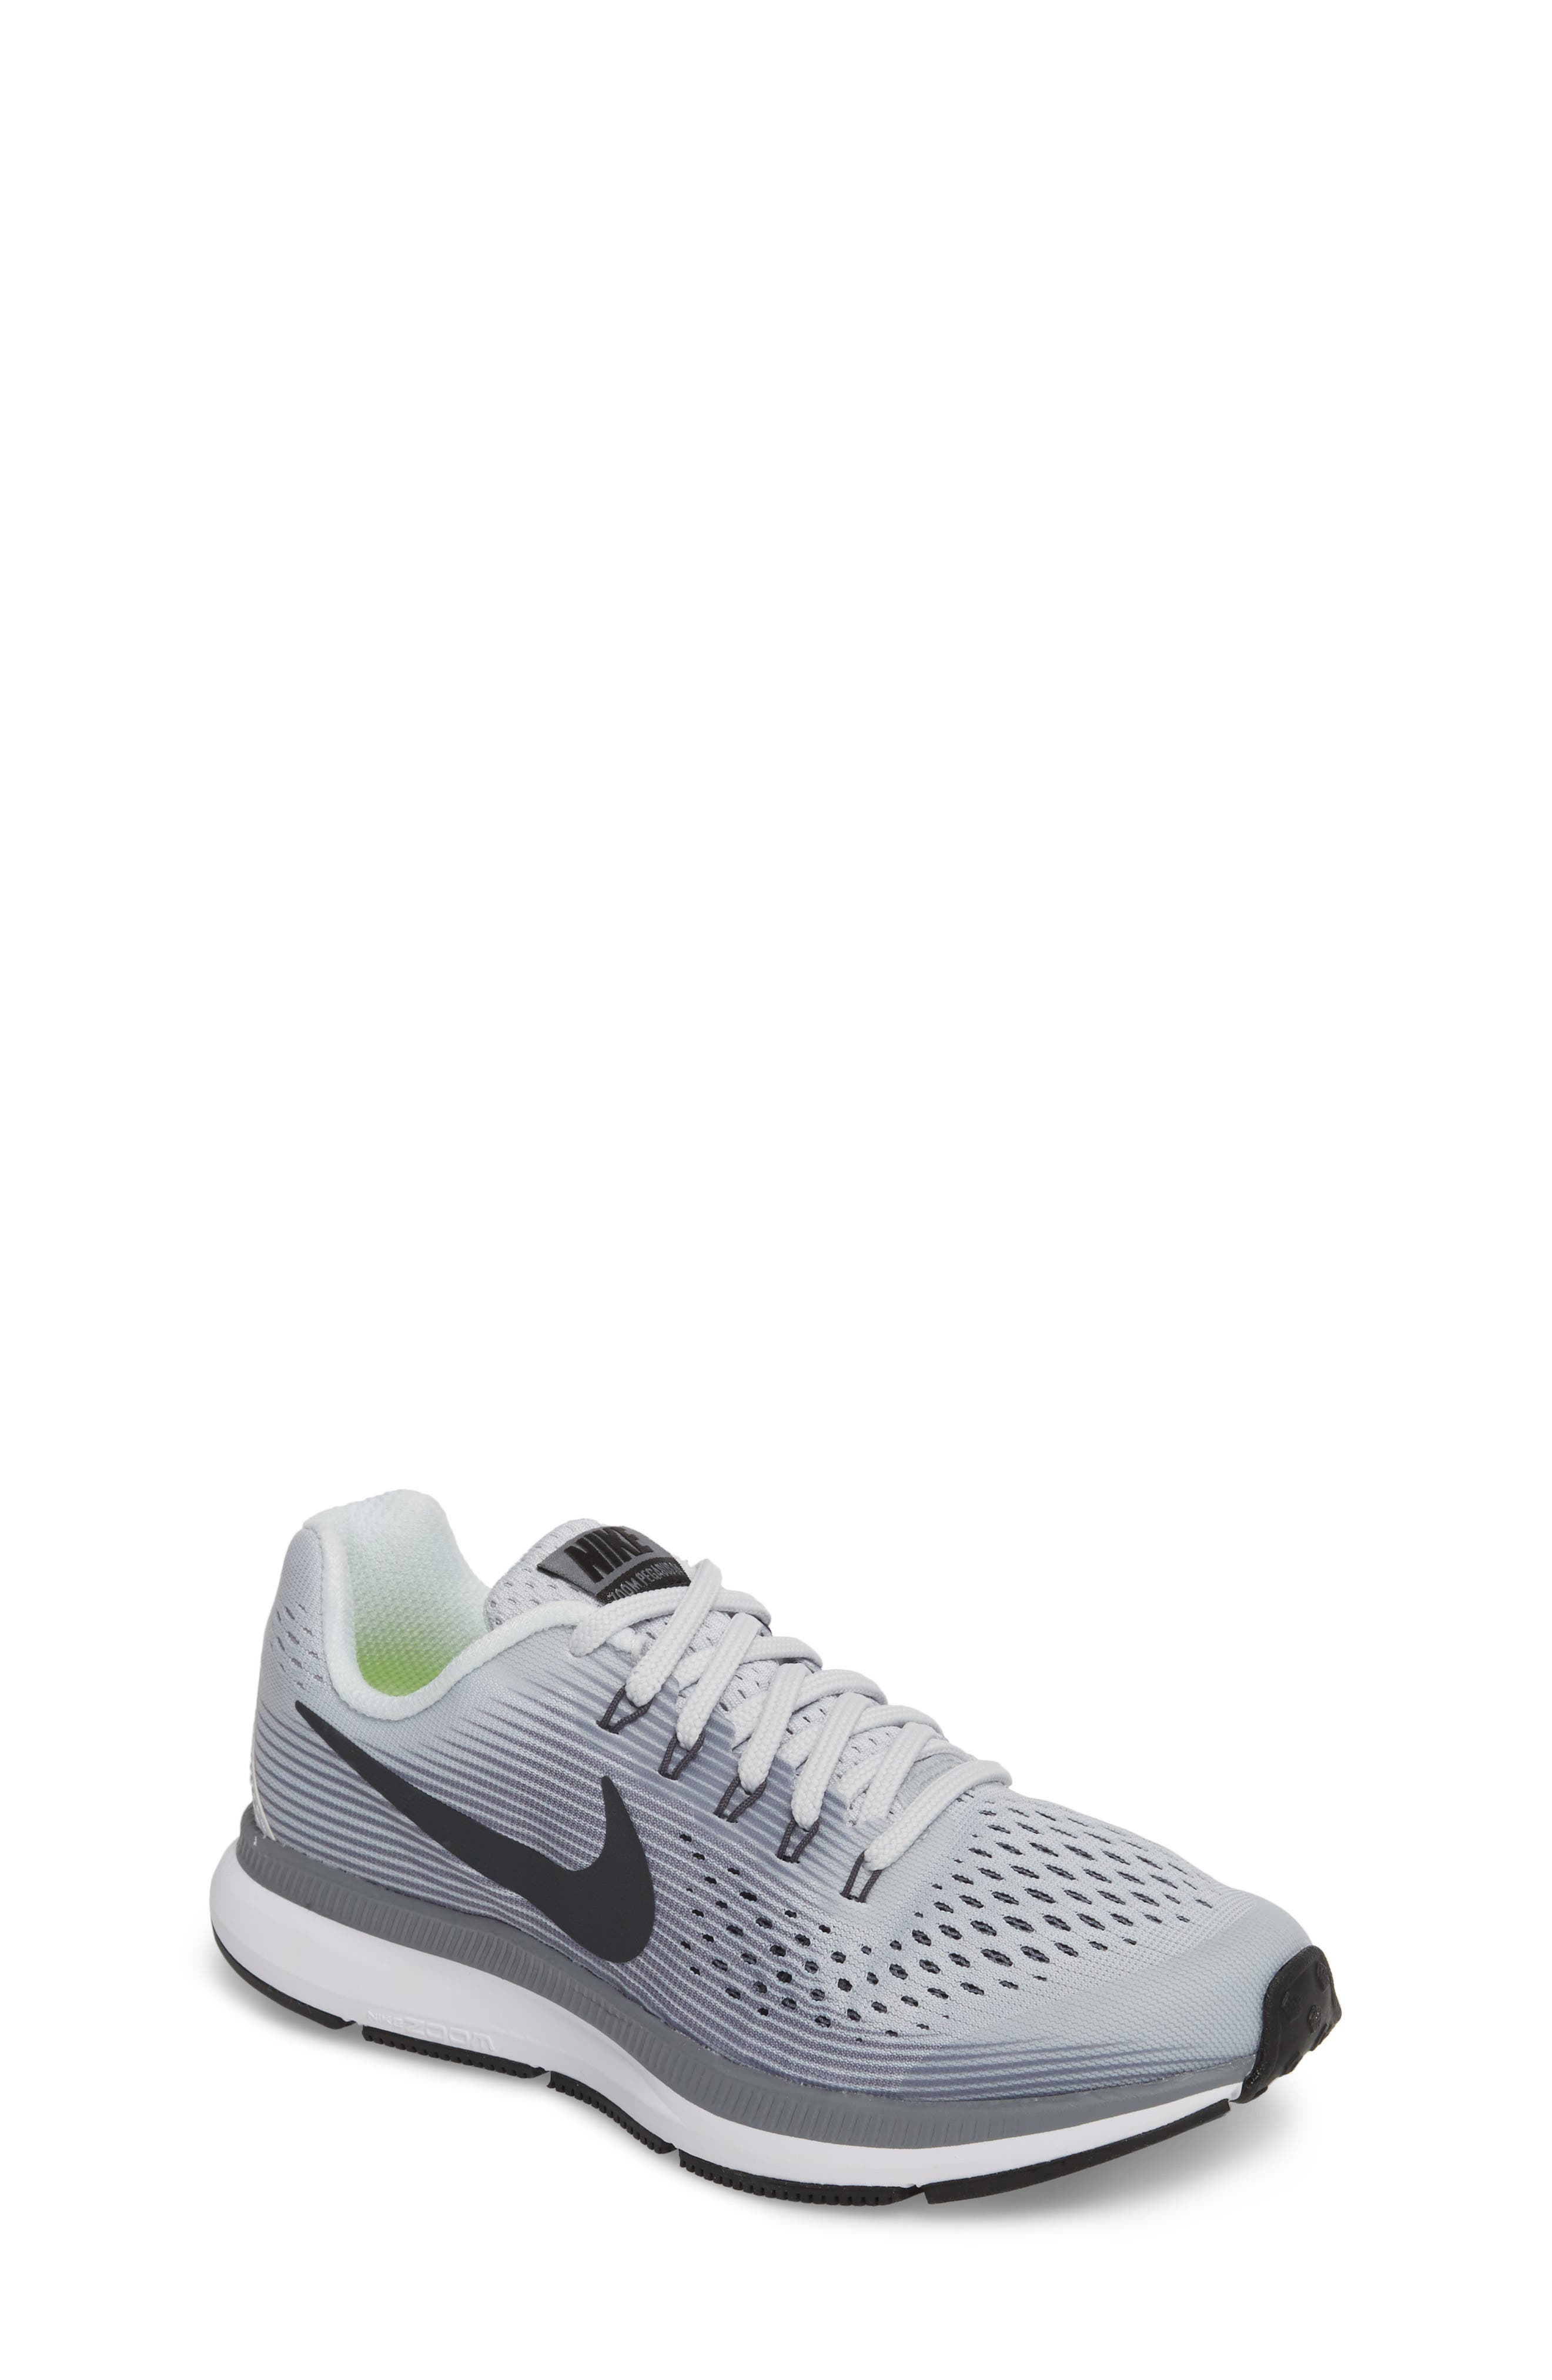 Zoom Pegasus 34 Sneaker,                         Main,                         color, Platinum/ Anthracite/ Grey